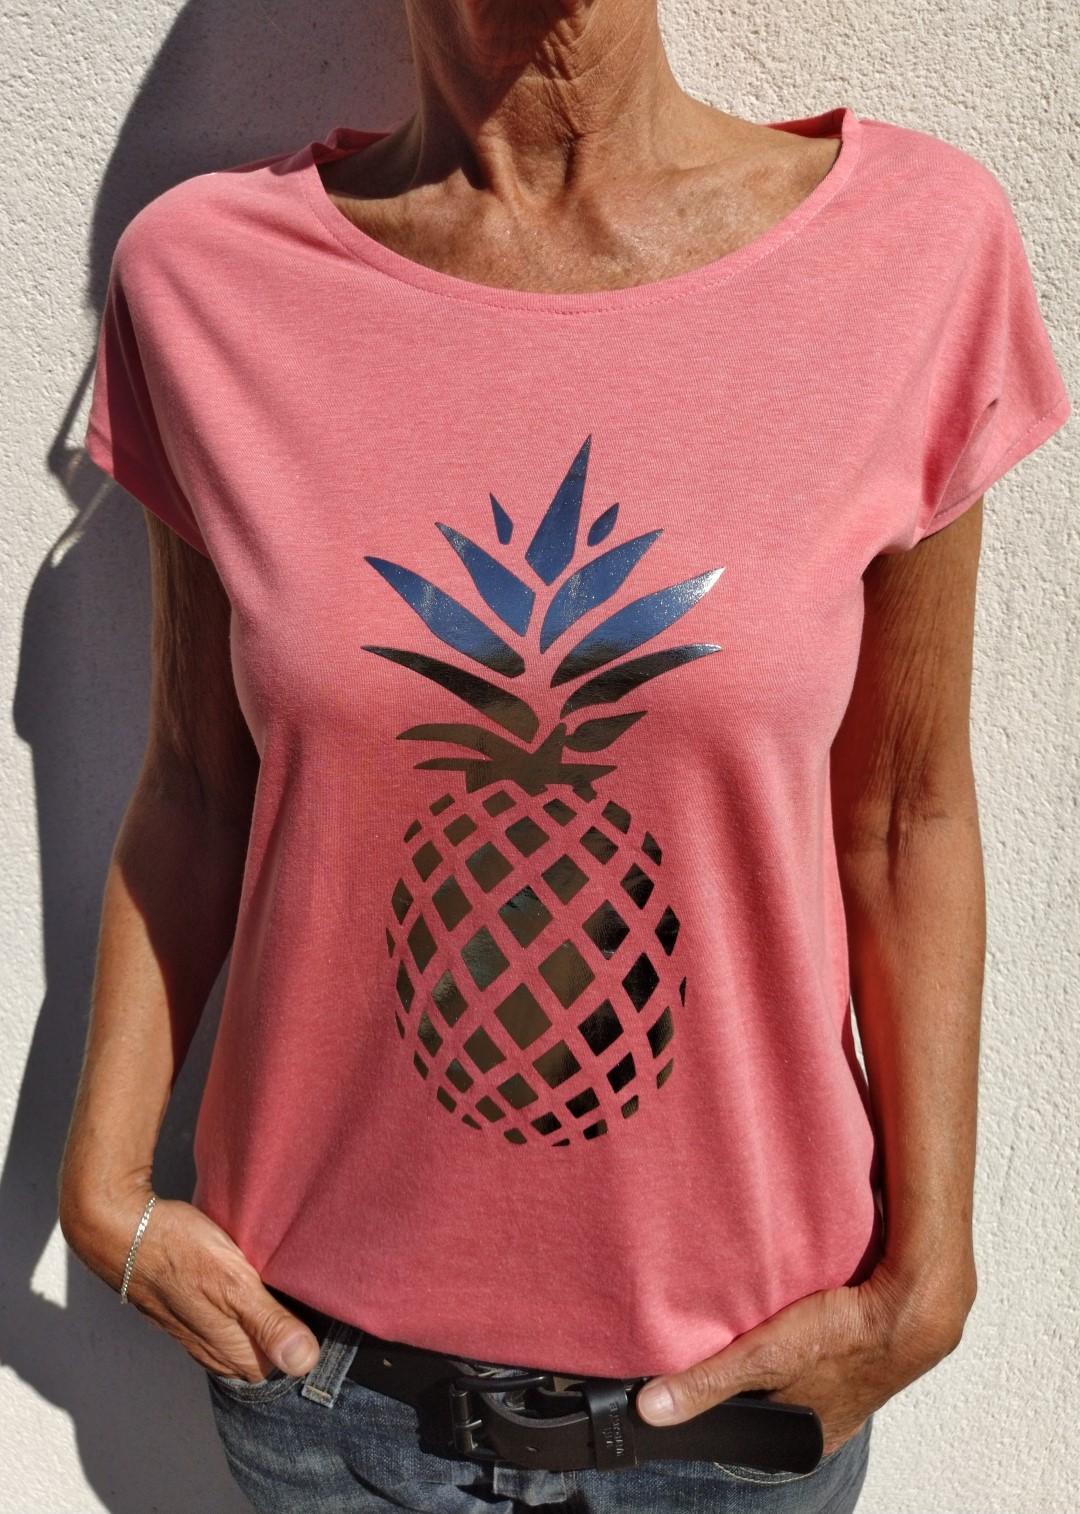 Tee shirt corail N°55 Ananas argent